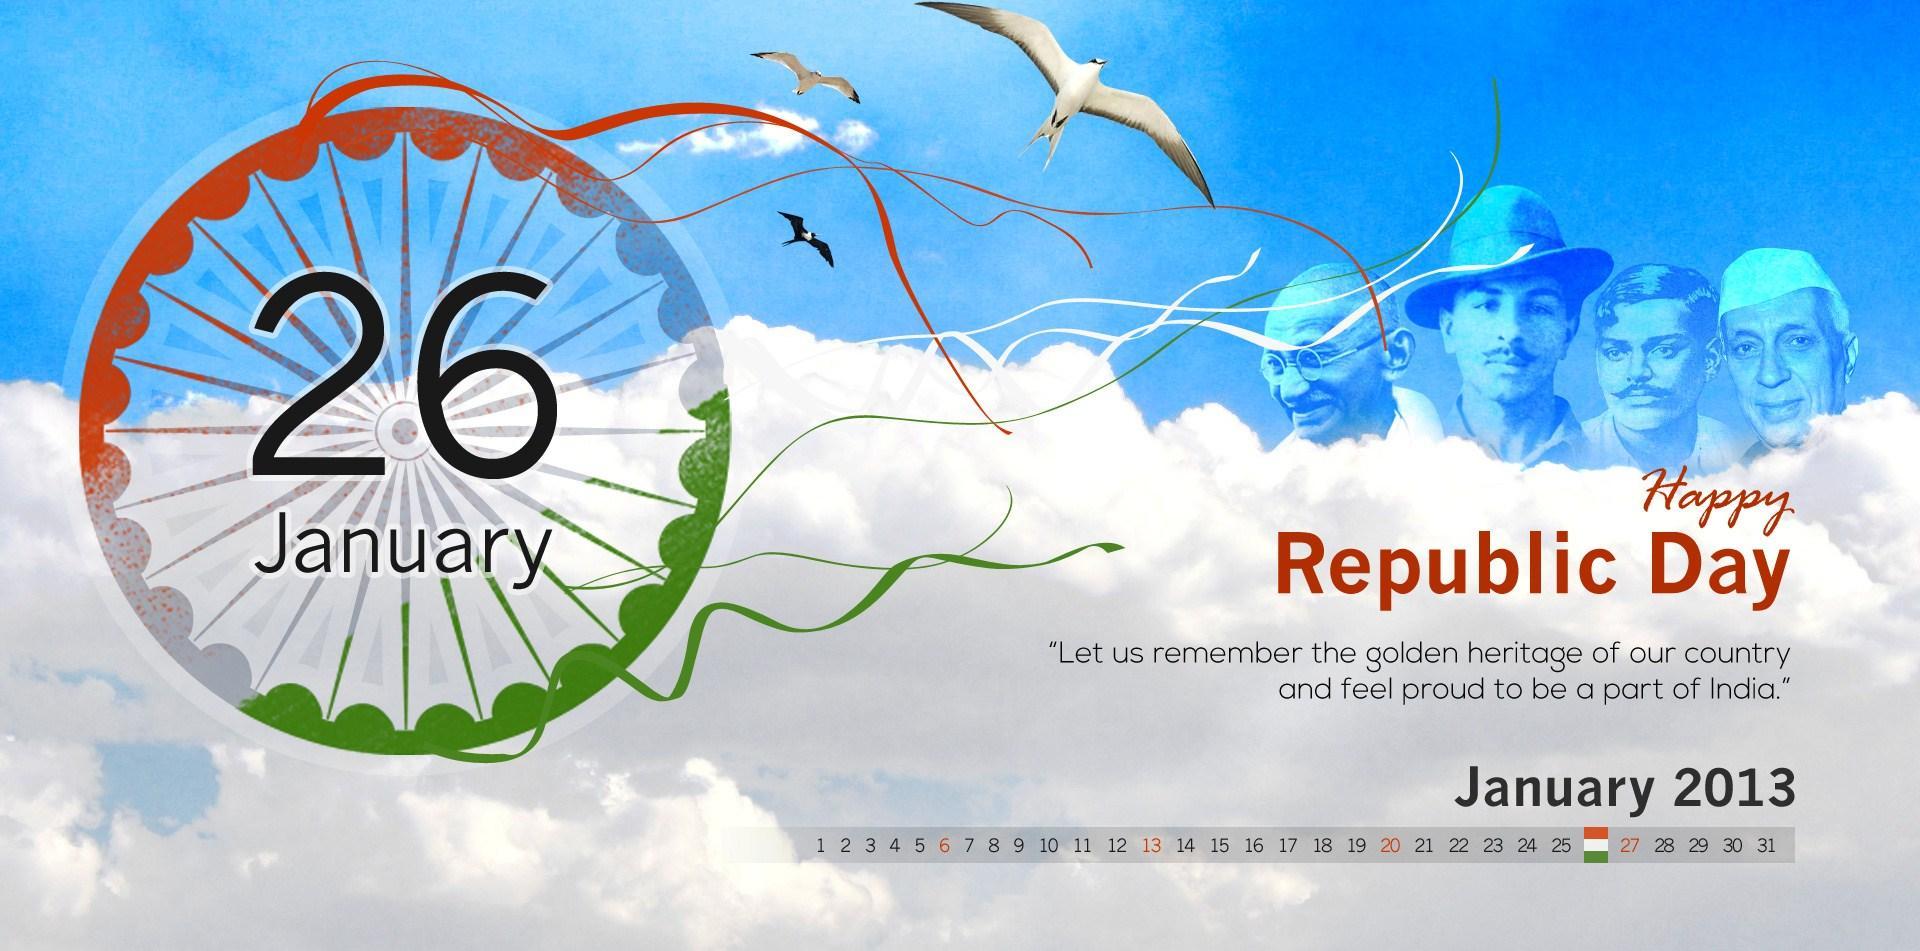 Republic Day Images For Desktop